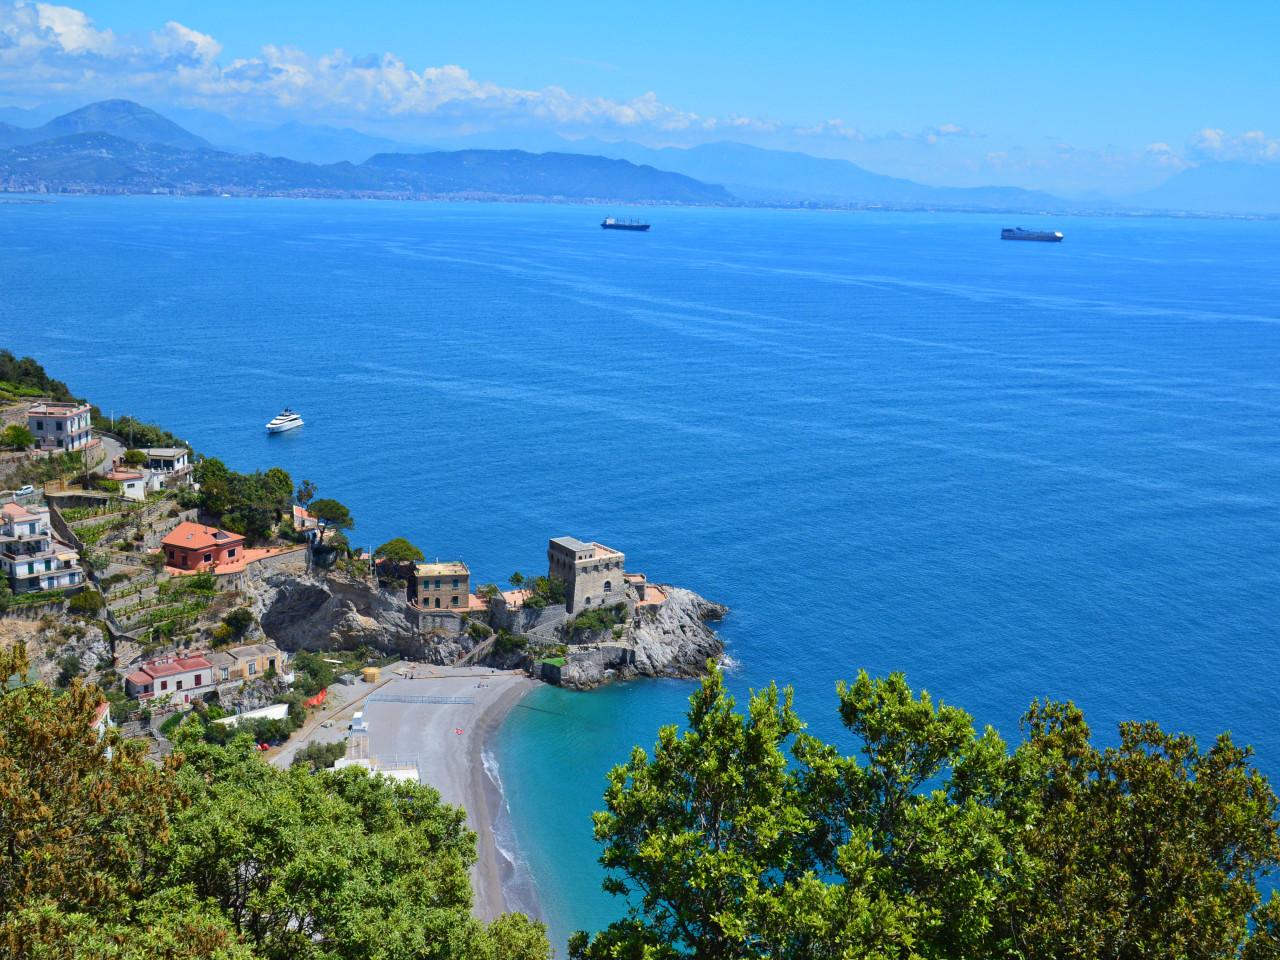 Il borgo di Erchie - Travel Amalfi Coast by Travelmar